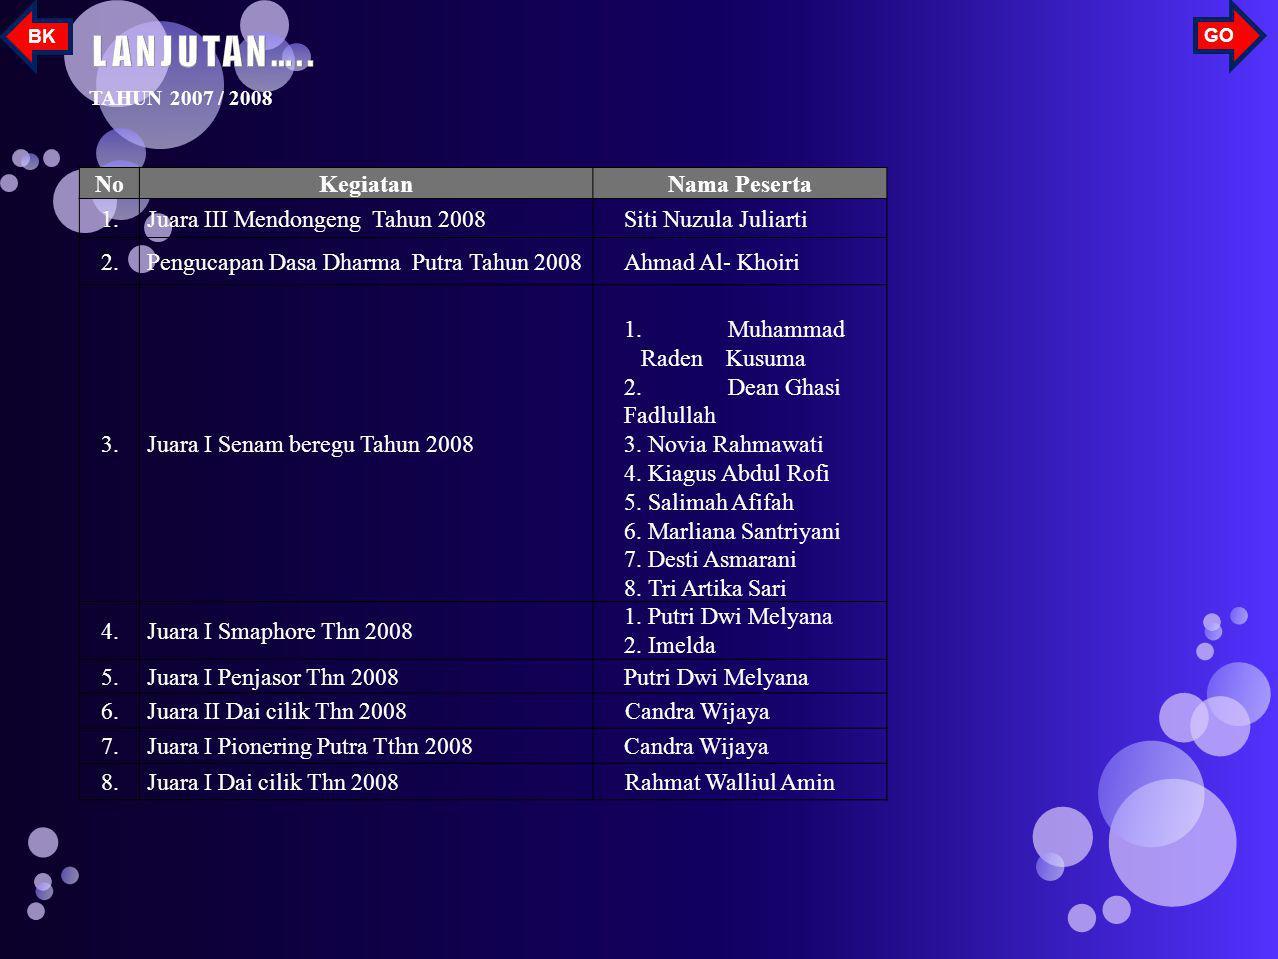 NoKegiatanNama Peserta 7. Jauara Umum I Penggalang SD/MI sekota Palembang Rafly Ikbal P.Rama 4. Abd Fahlevi 5. Candra W 6. Al Khoiri 7. Dean Ghasi 8.